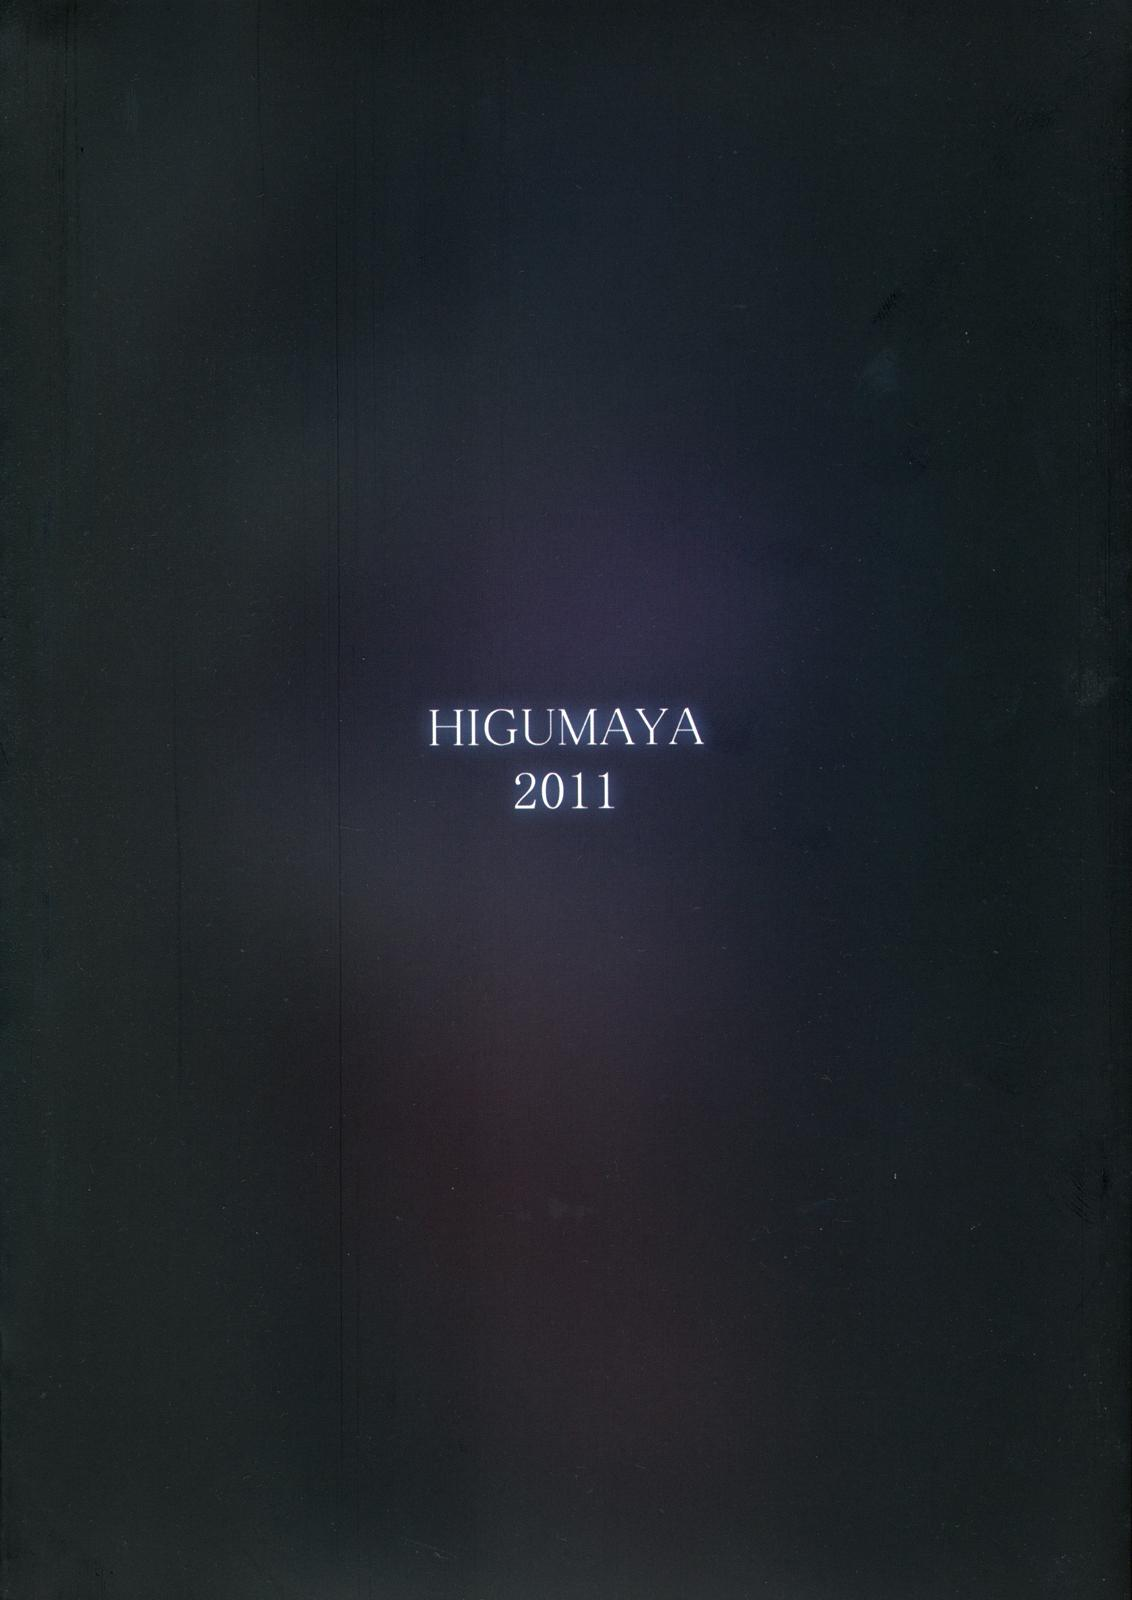 (C81) [Higuma-ya (Nora Higuma)] Nami-san ga! (One Piece) [English] colorized (incomplete) 1